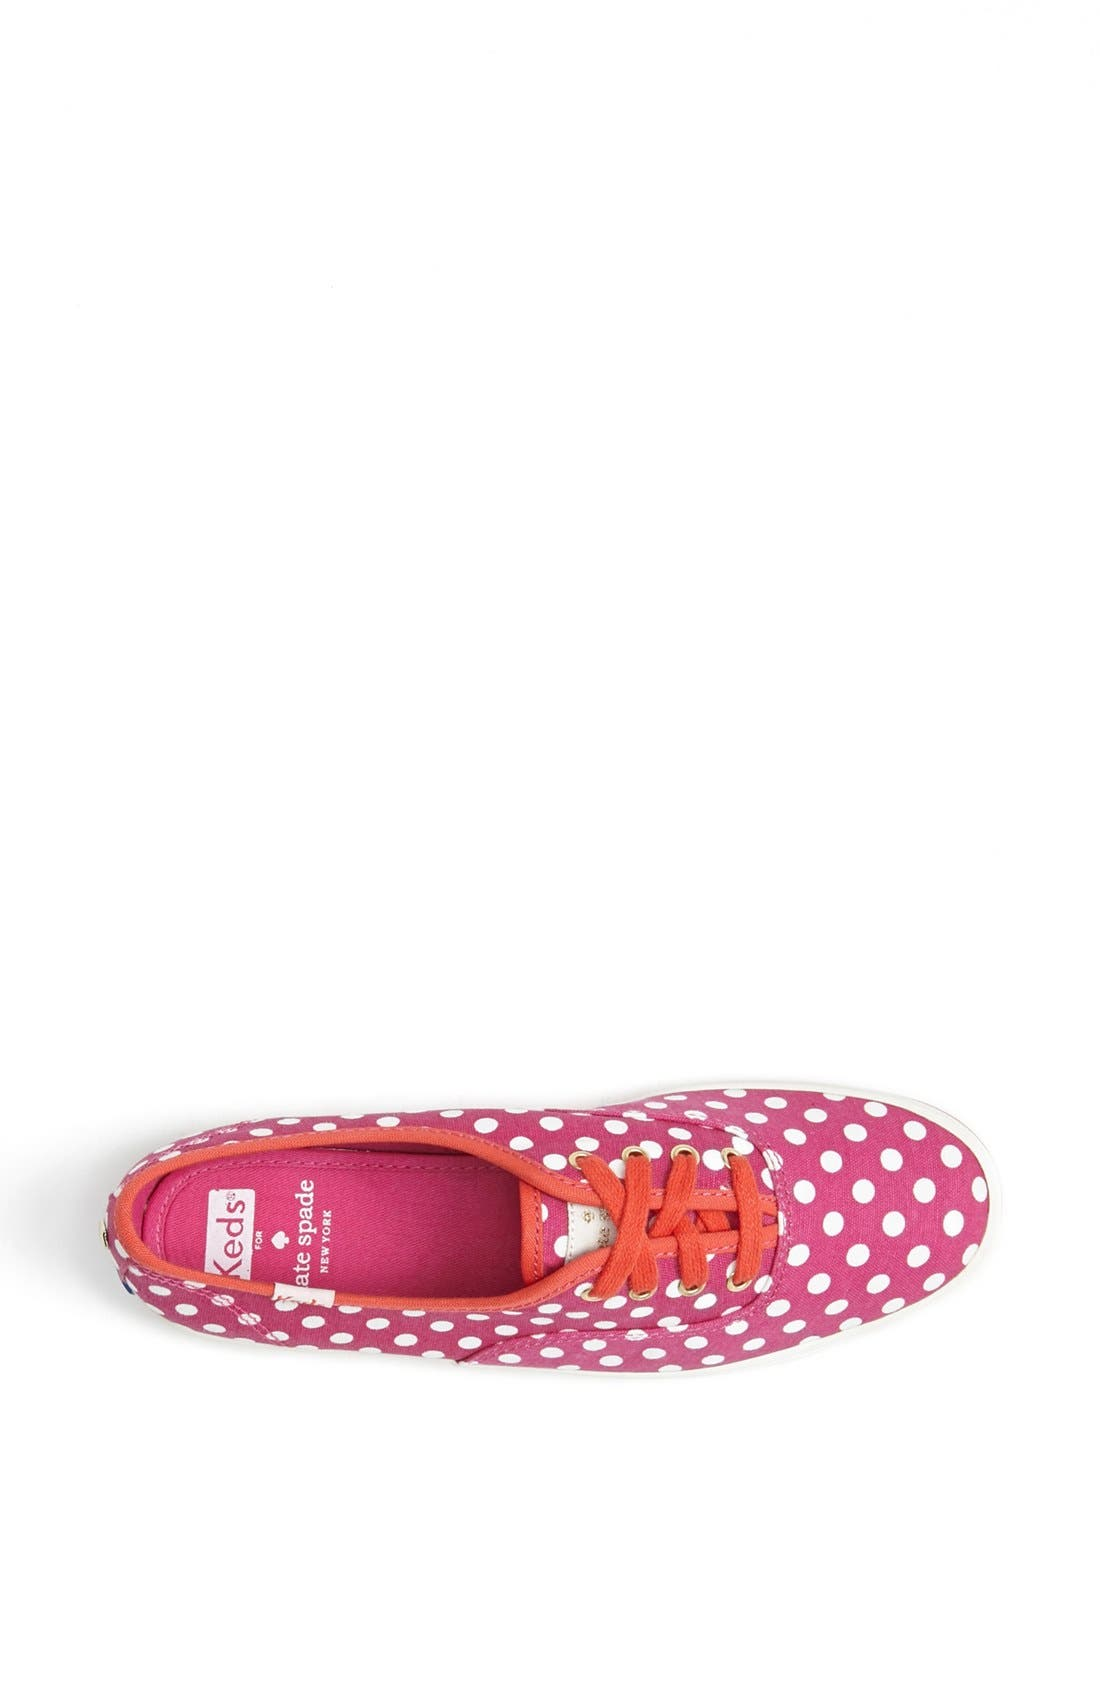 Alternate Image 3  - Keds® for kate spade new york 'kick' sneaker